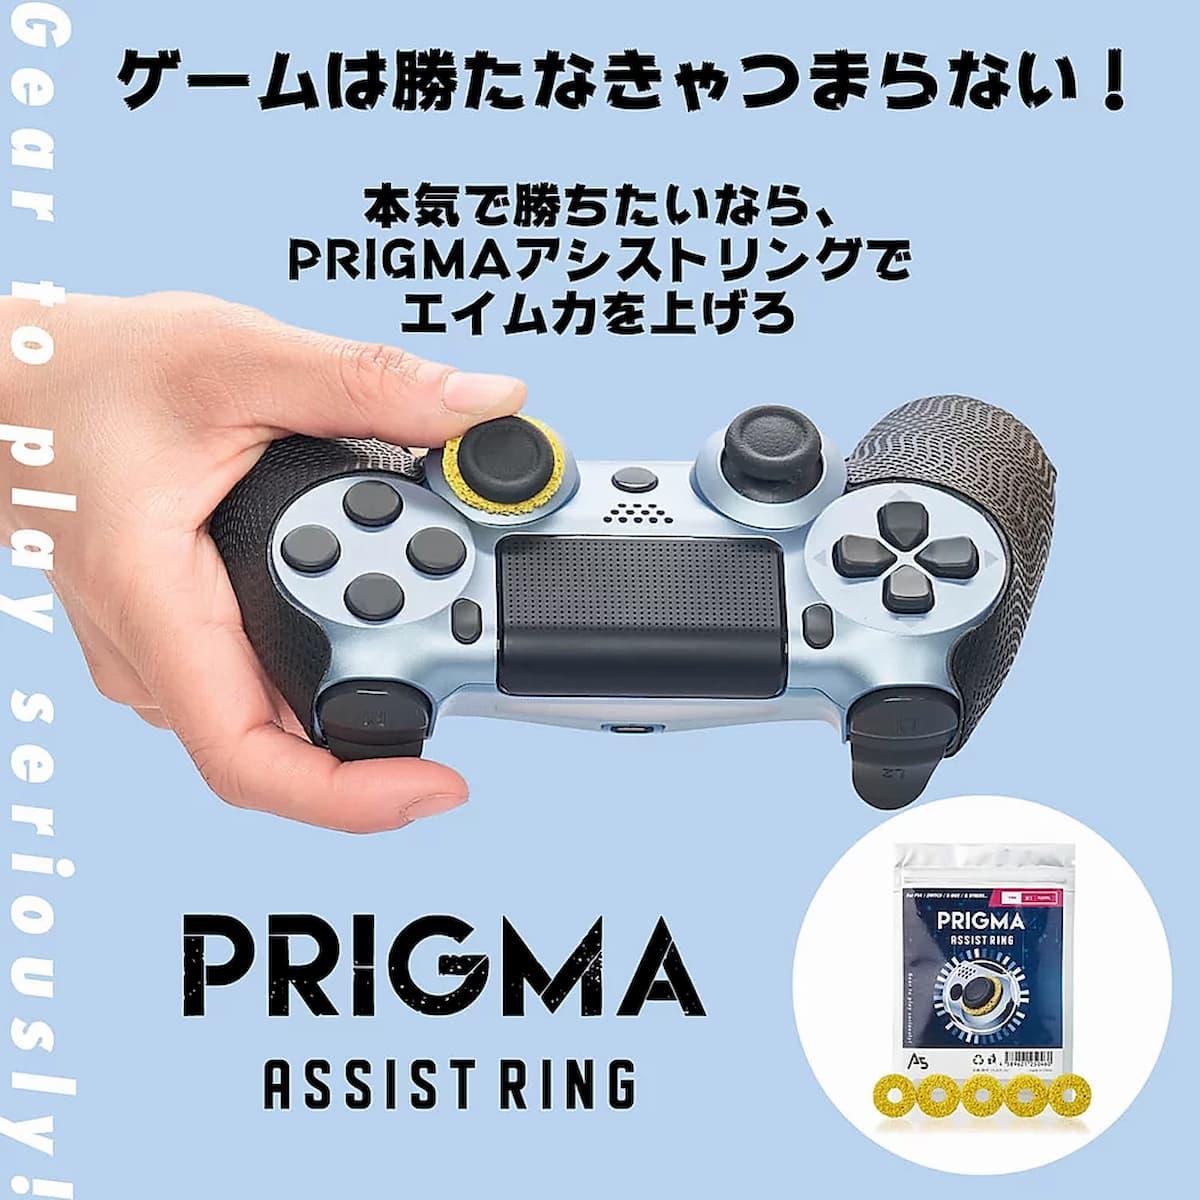 PRIGMA・ASSISTRING